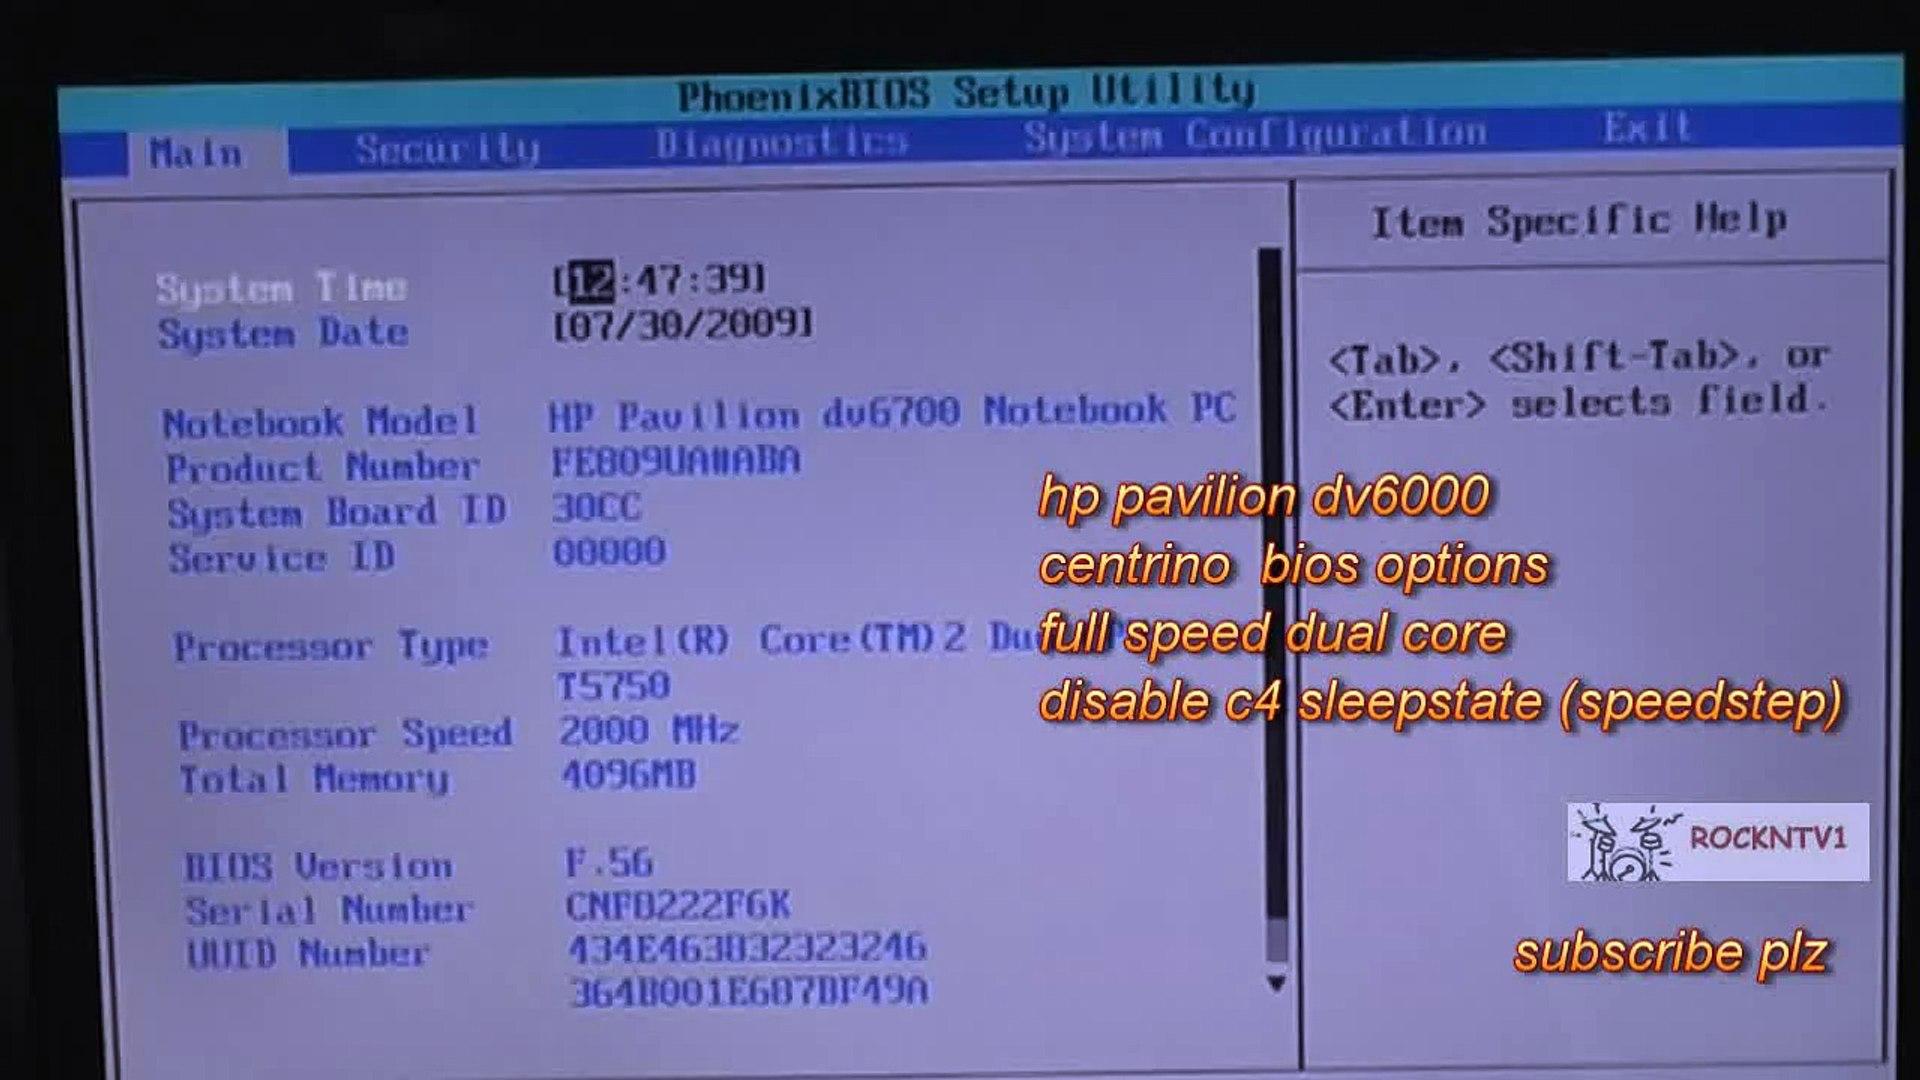 hp dv6000 centrino bios laptop overclocking with c4 sleep disabled